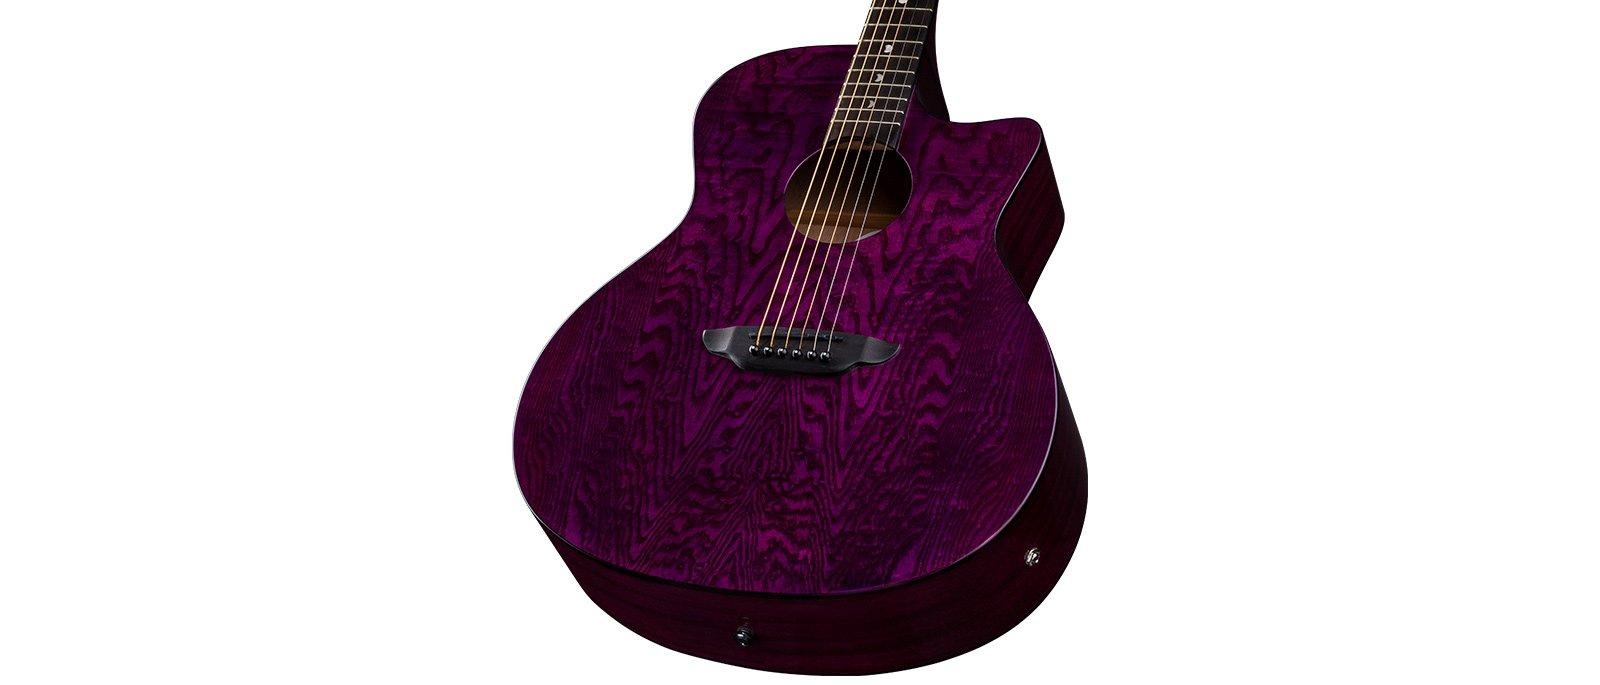 Luna Gypsy Quilt Ash A/E Trans Purple